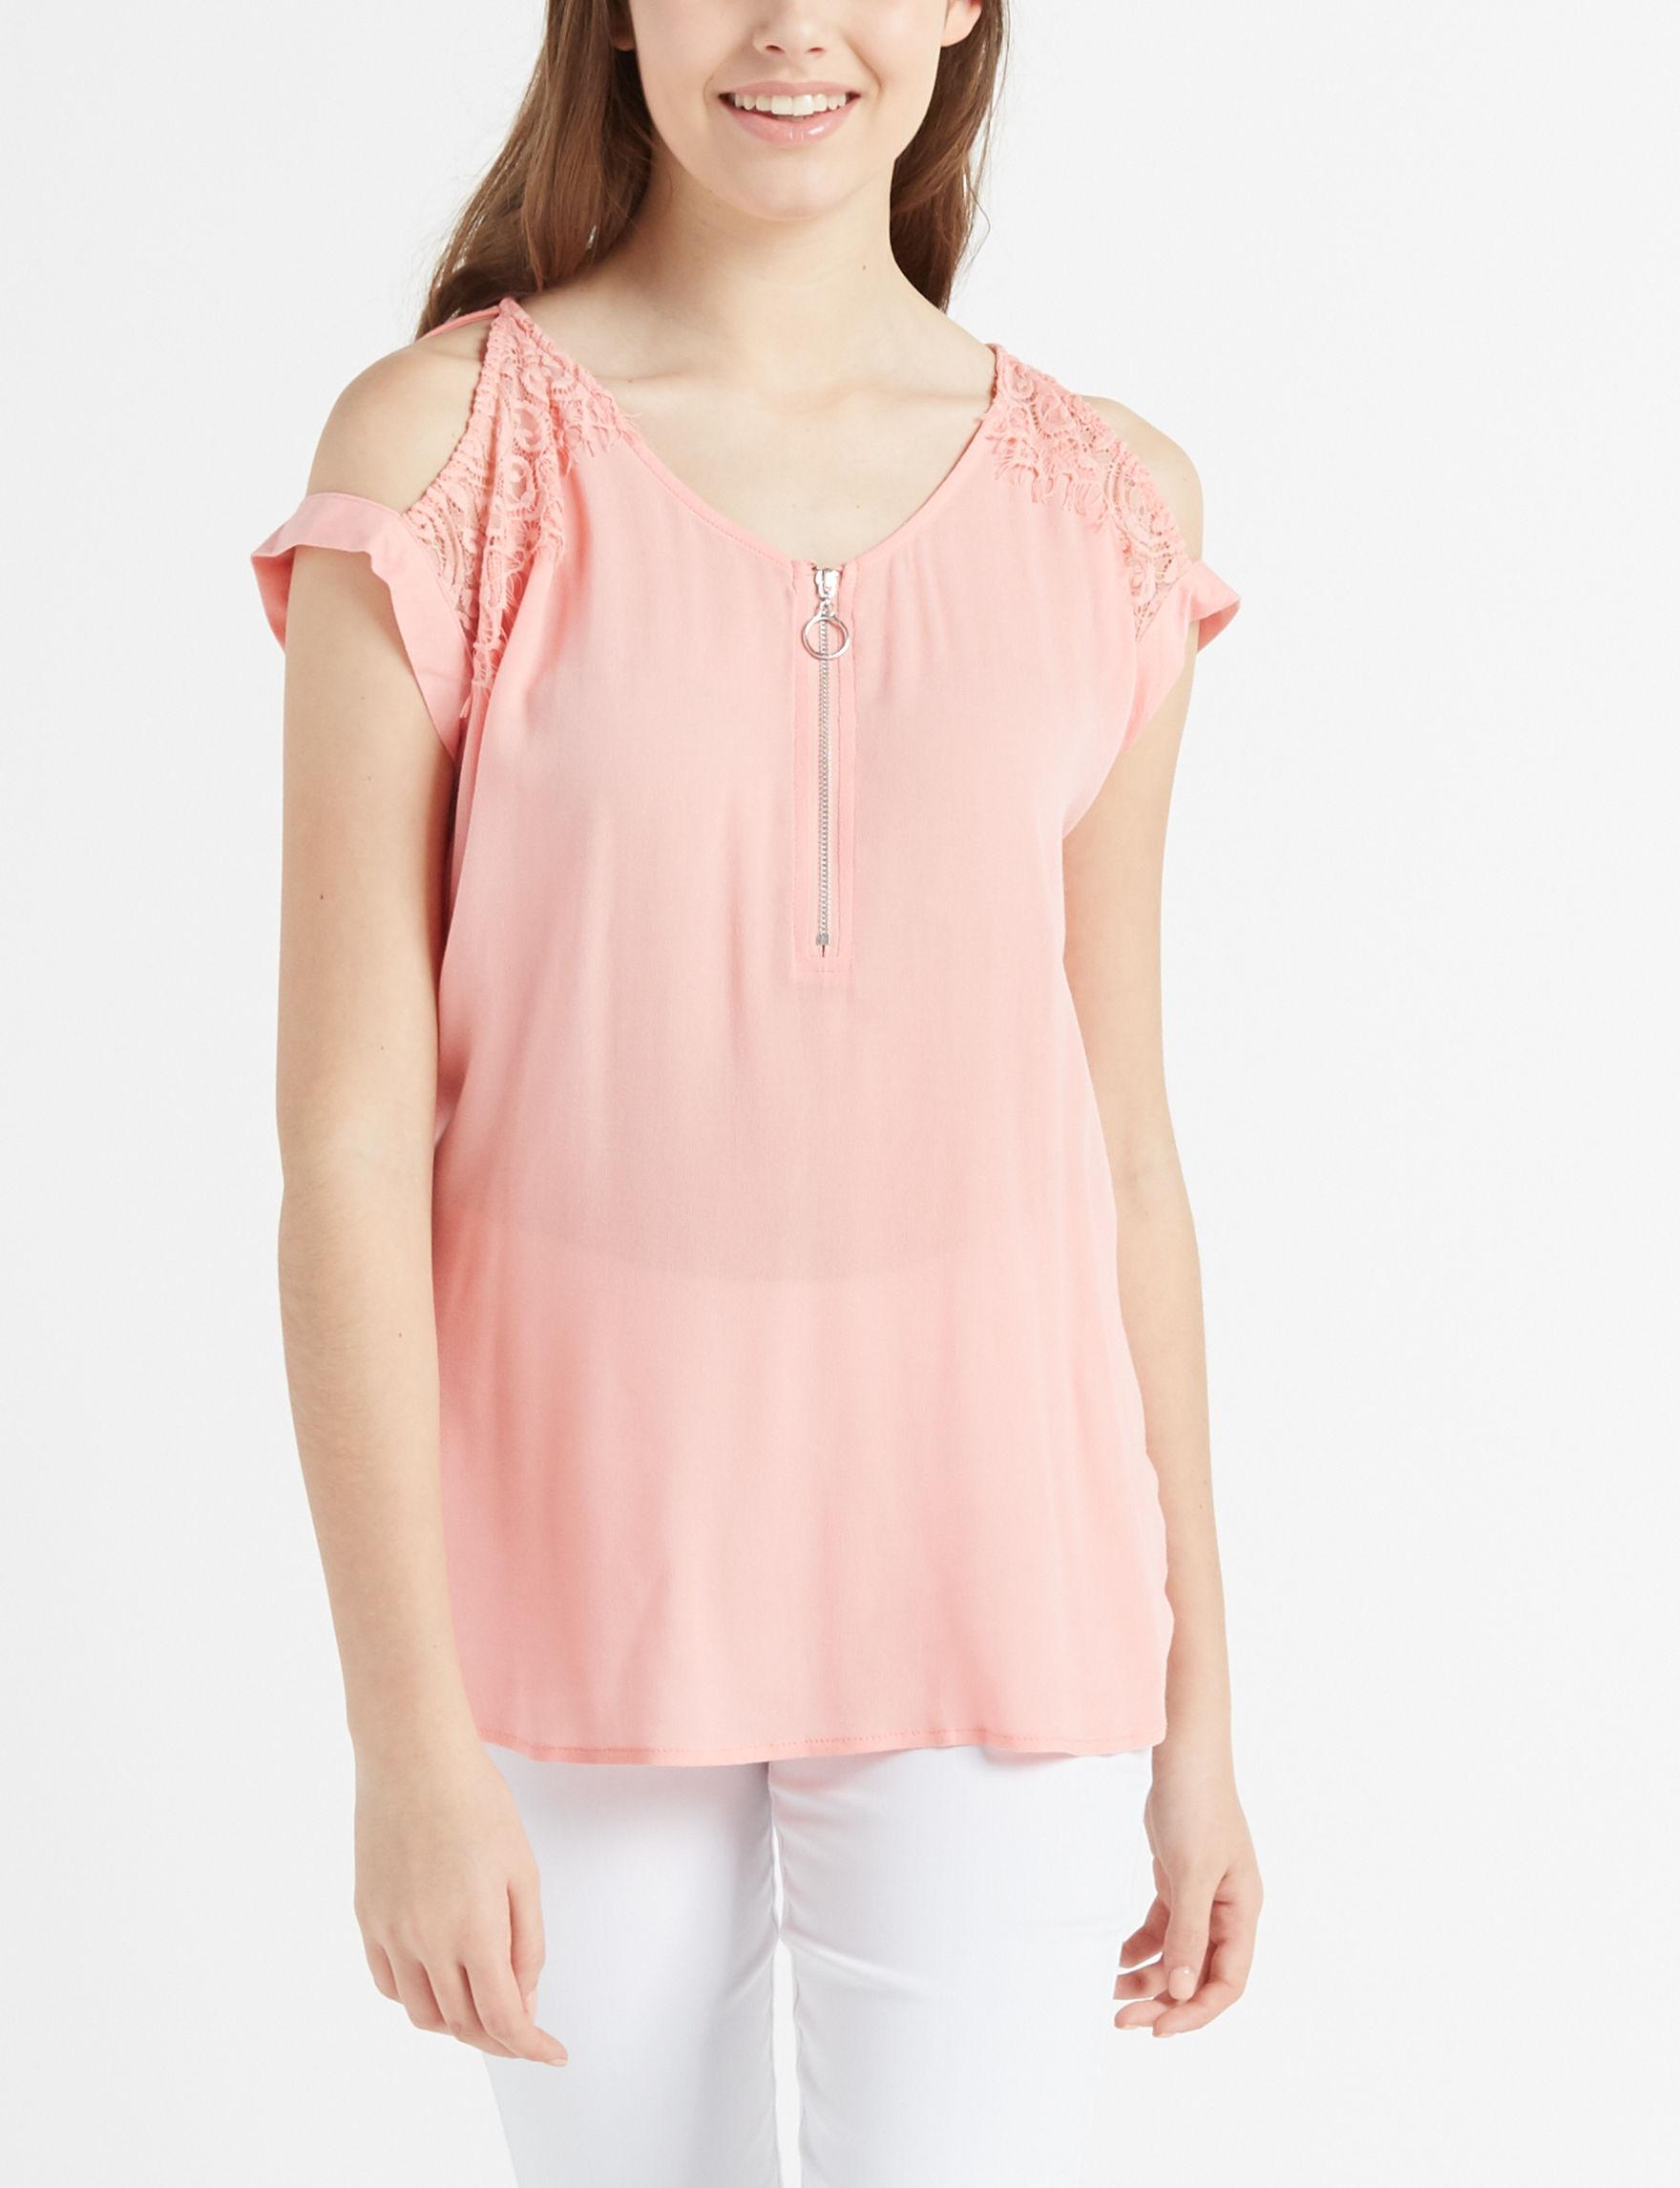 Leighton Coral Shirts & Blouses